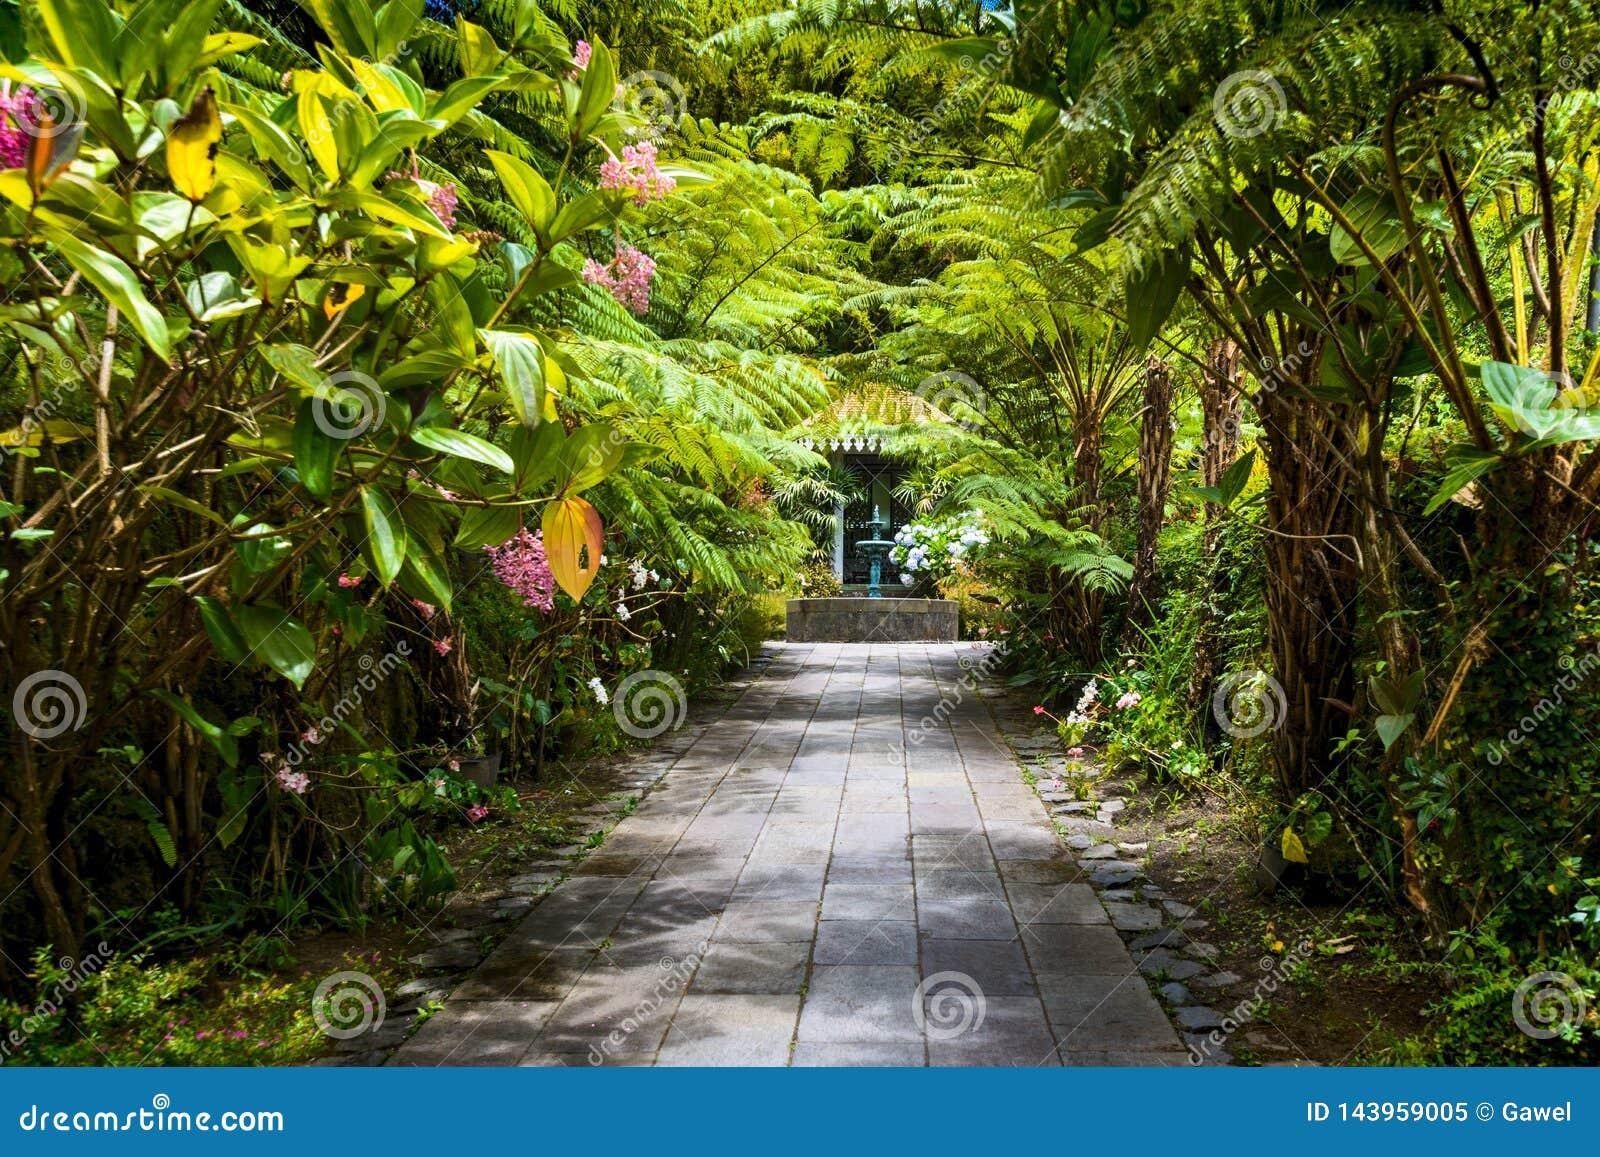 Folio de Maison de La de jardin botanique, Salazie, Reunion Island